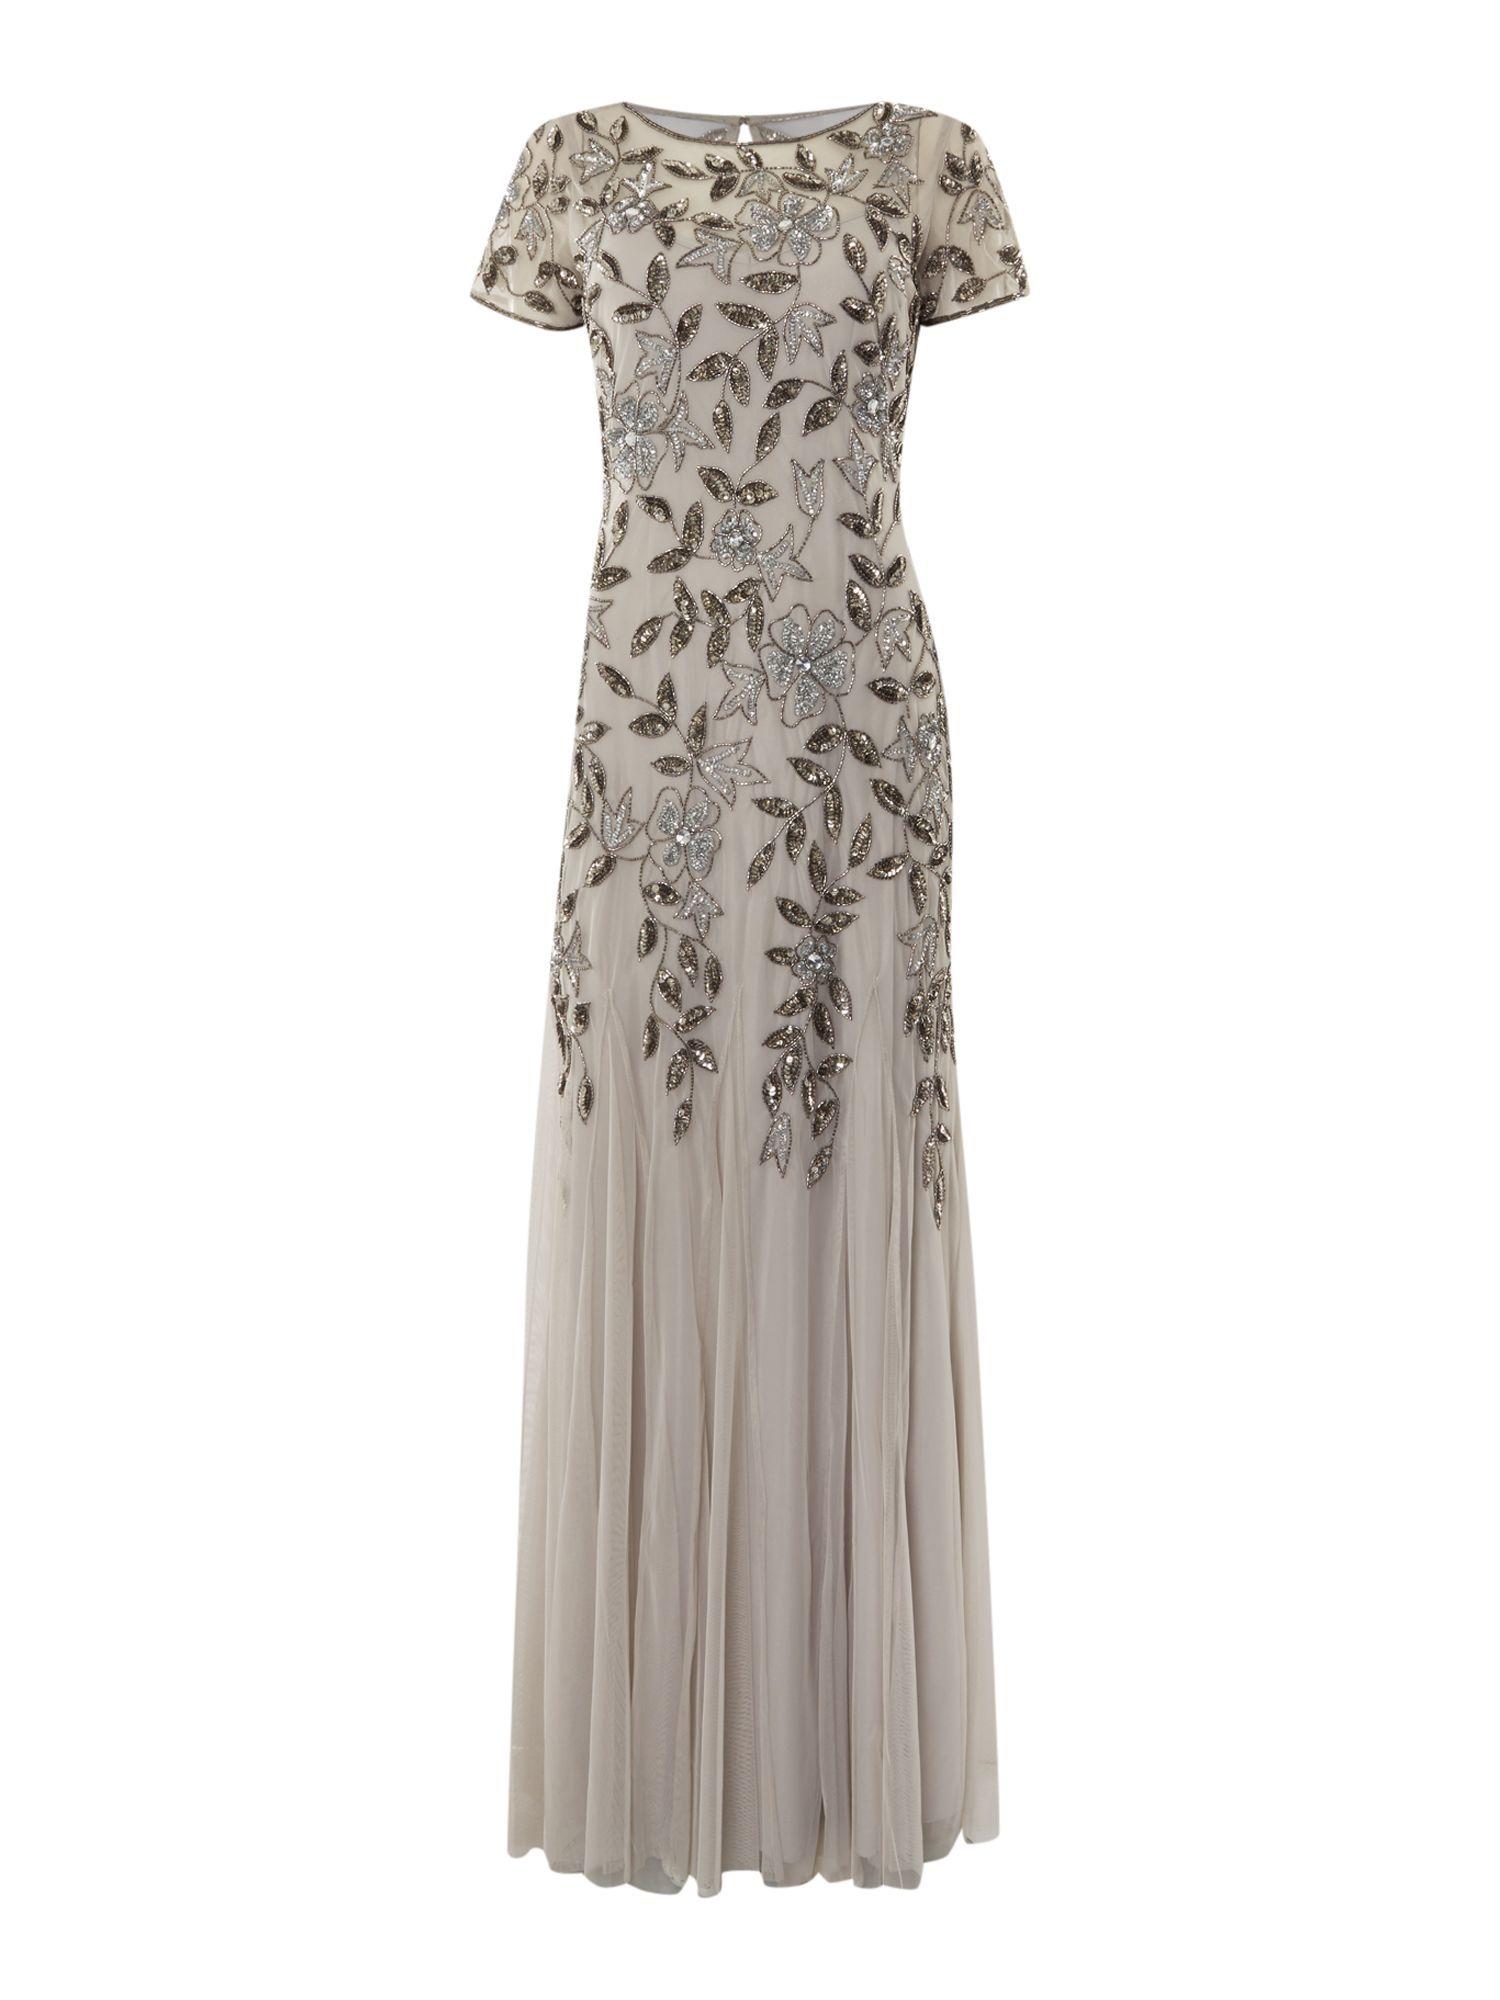 1920s Dresses Uk Flapper Gatsby Downton Abbey Dress Maxi Dress Evening Beaded Dress Long Flapper Dress Uk